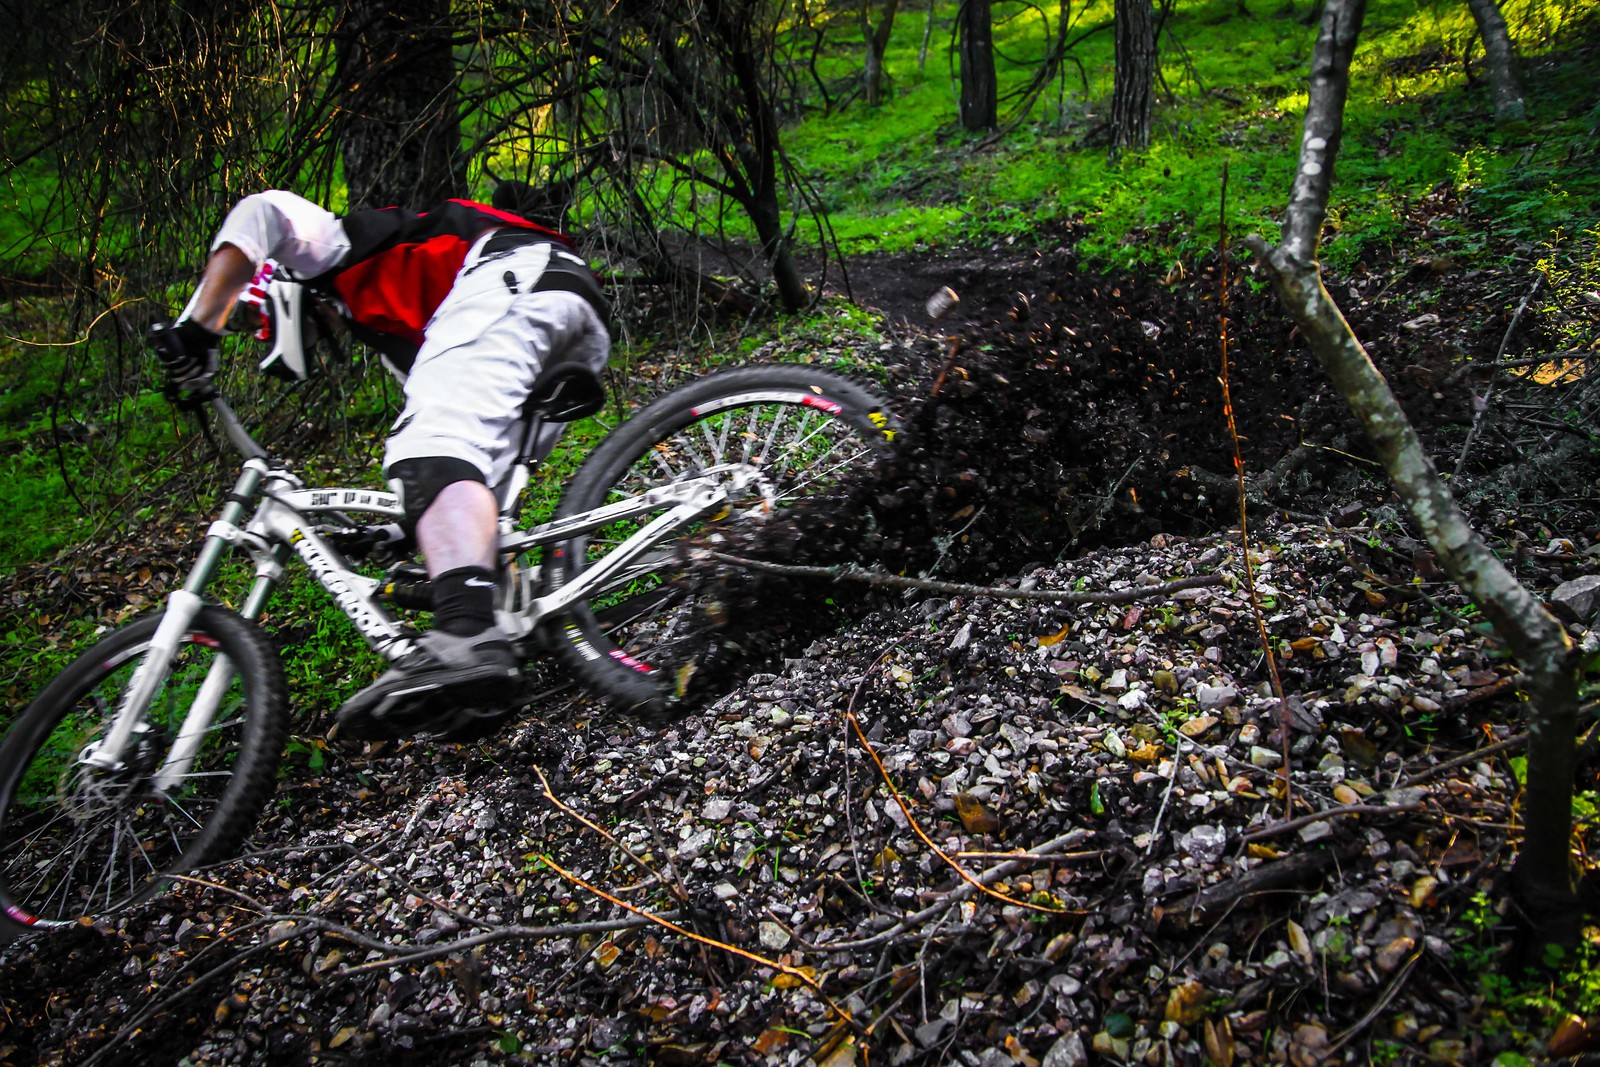 IMG 2649 - GnarHuck - Mountain Biking Pictures - Vital MTB